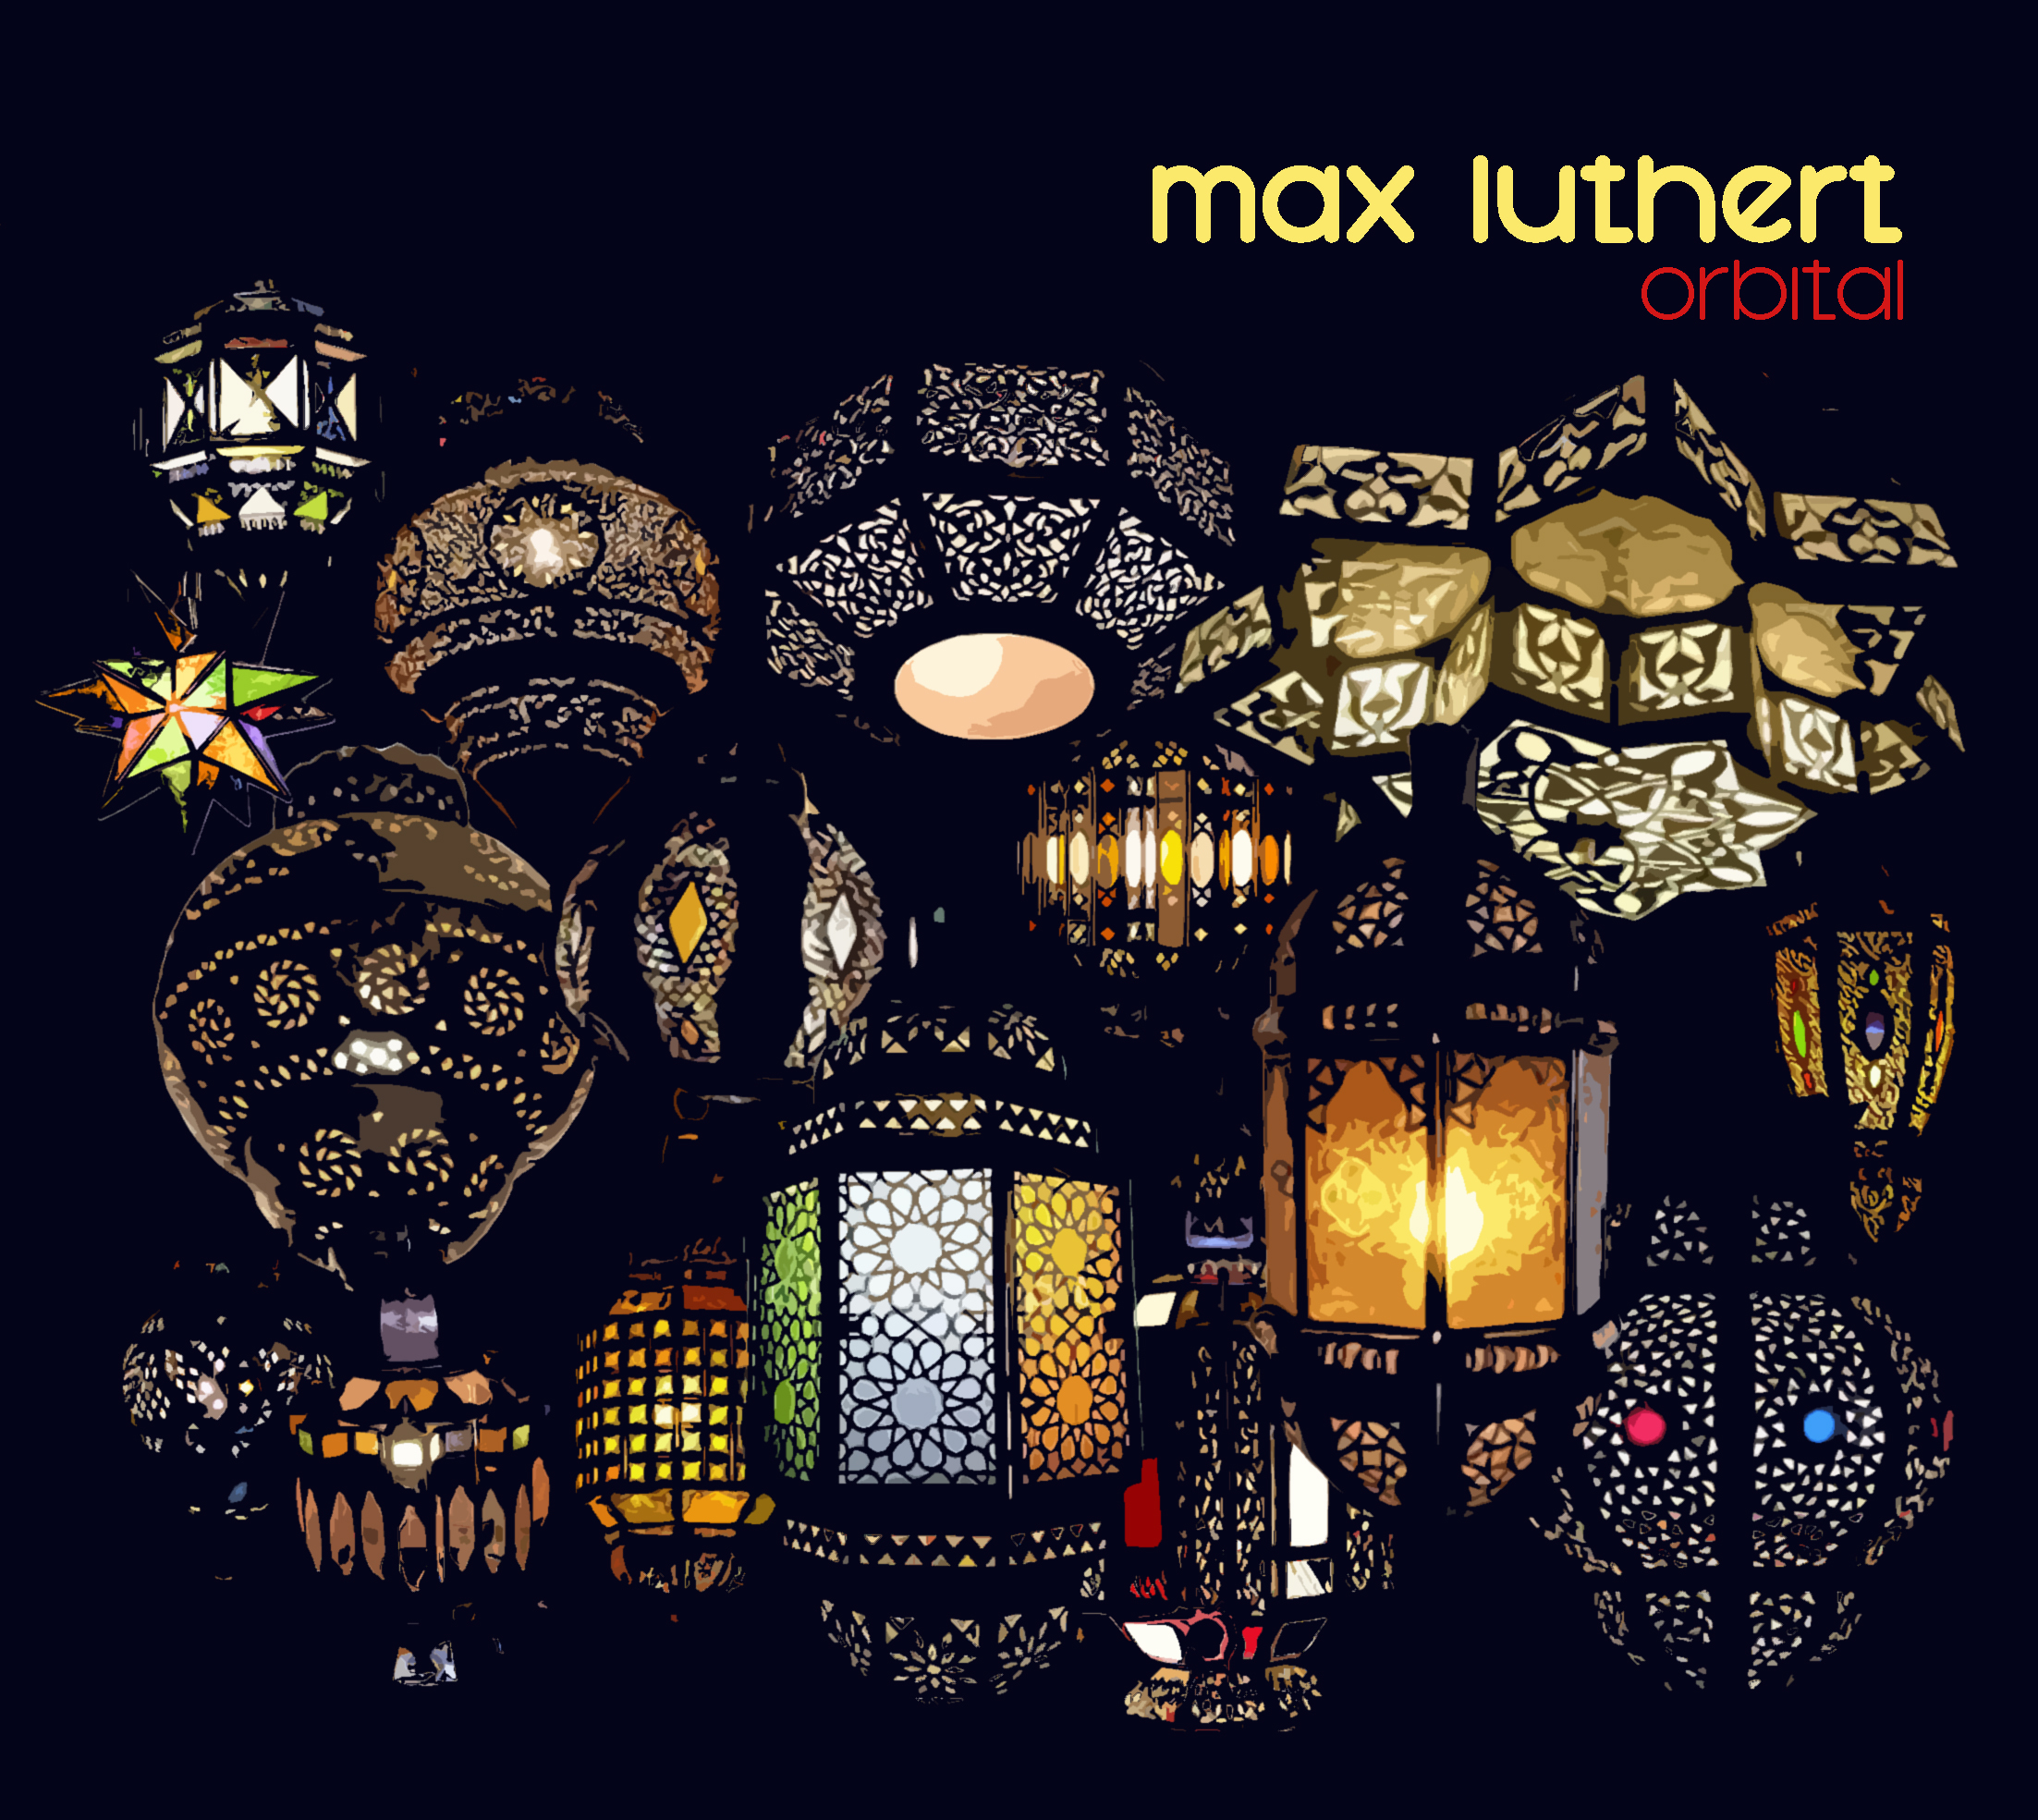 Orbital - Max Luthert Whirlwind Recordings 2014